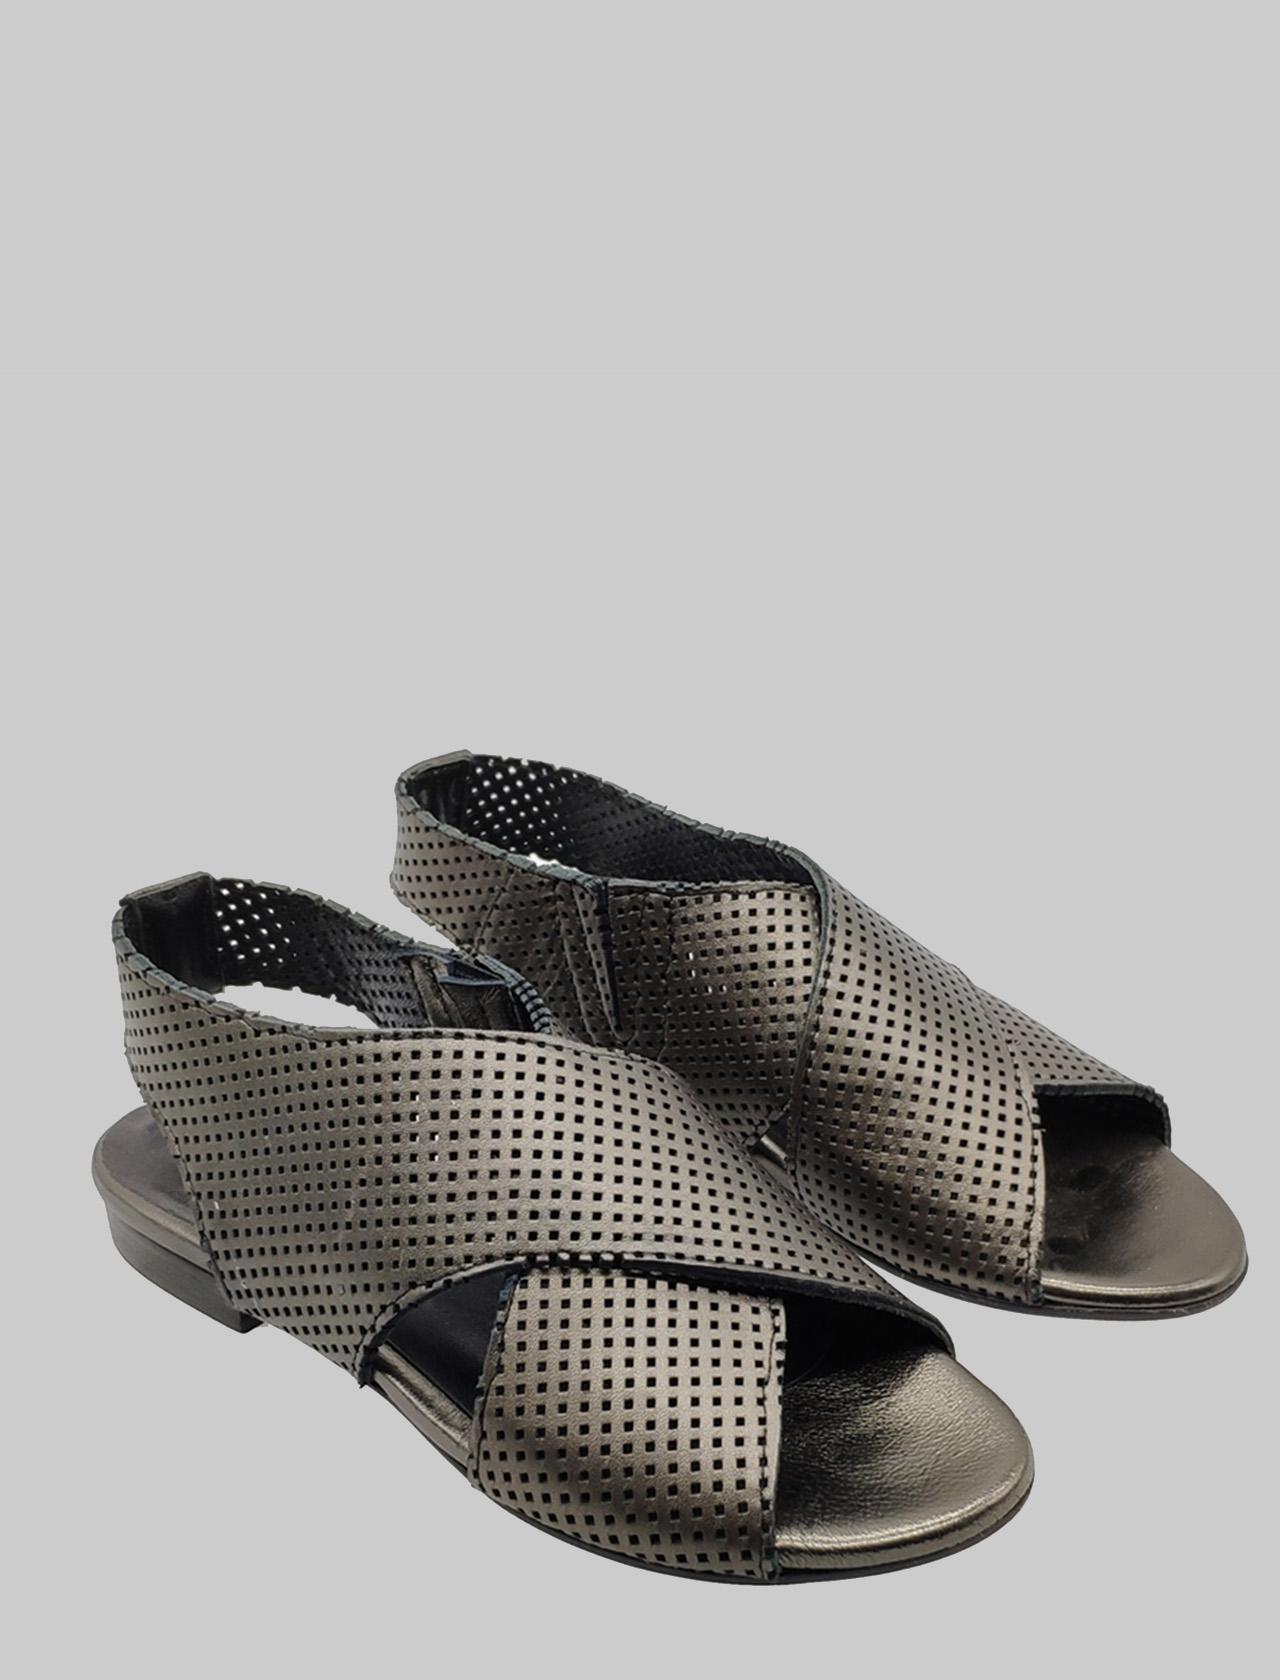 Zoe | Flat sandals | DUFFY062